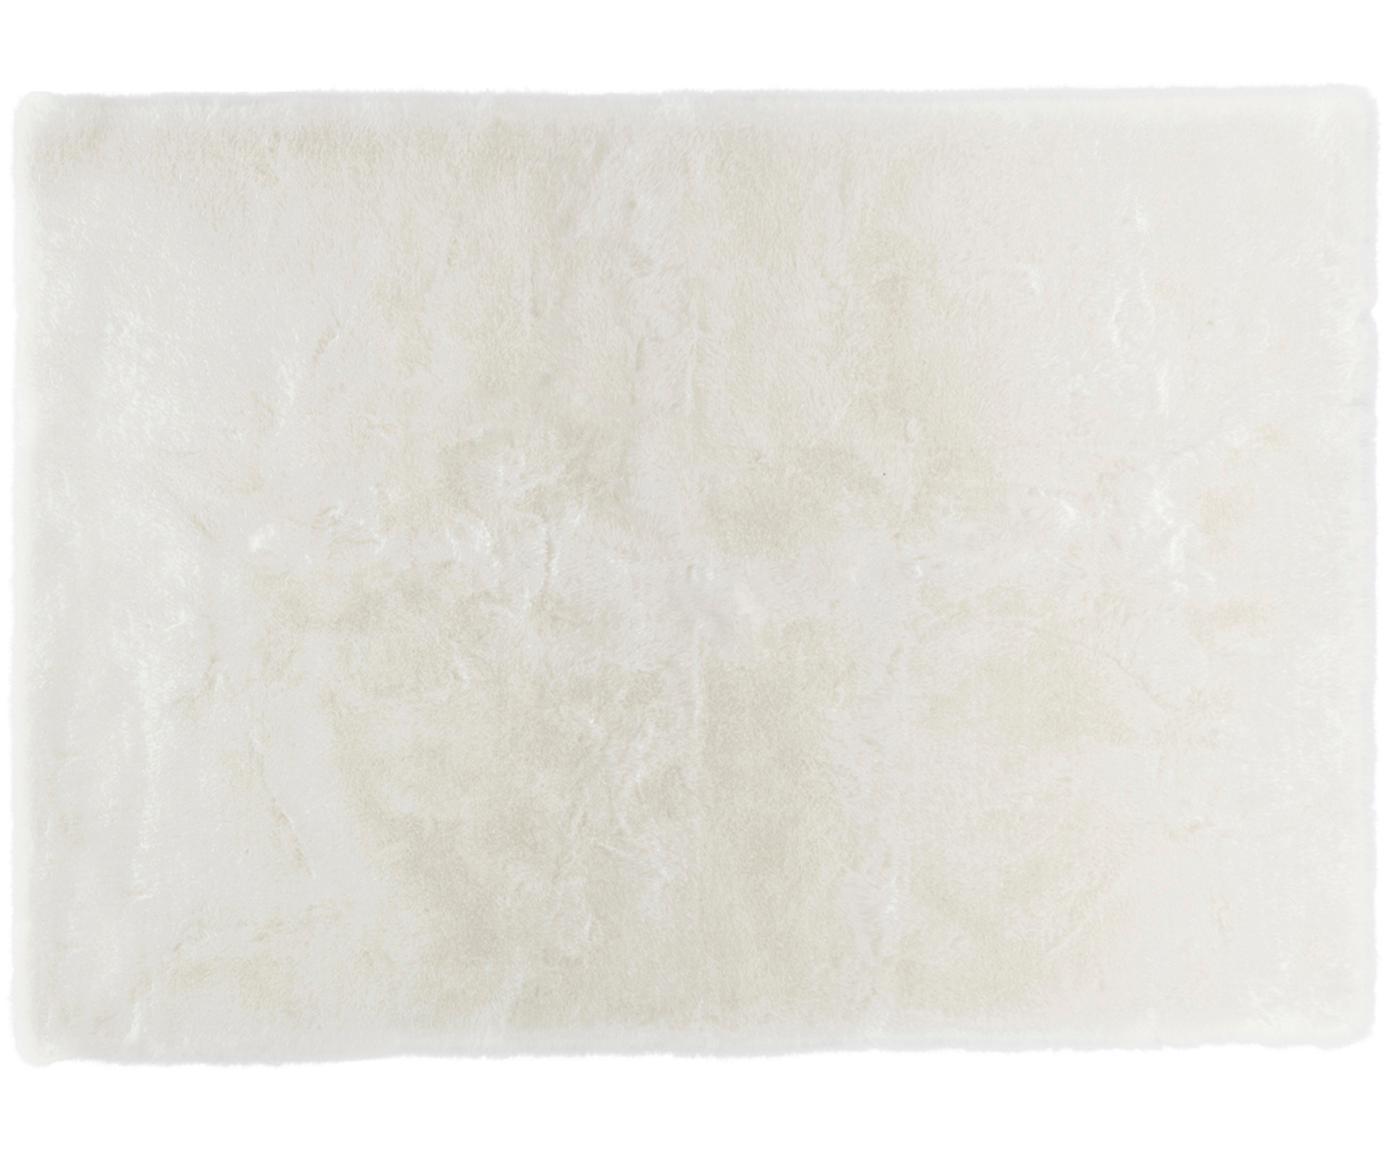 Alfombra de piel sintética Superior, Parte superior: 95% acrílico, 5% poliéste, Reverso: cuero sintético, Blanco, An 120 x L 170 cm (Tamaño S)